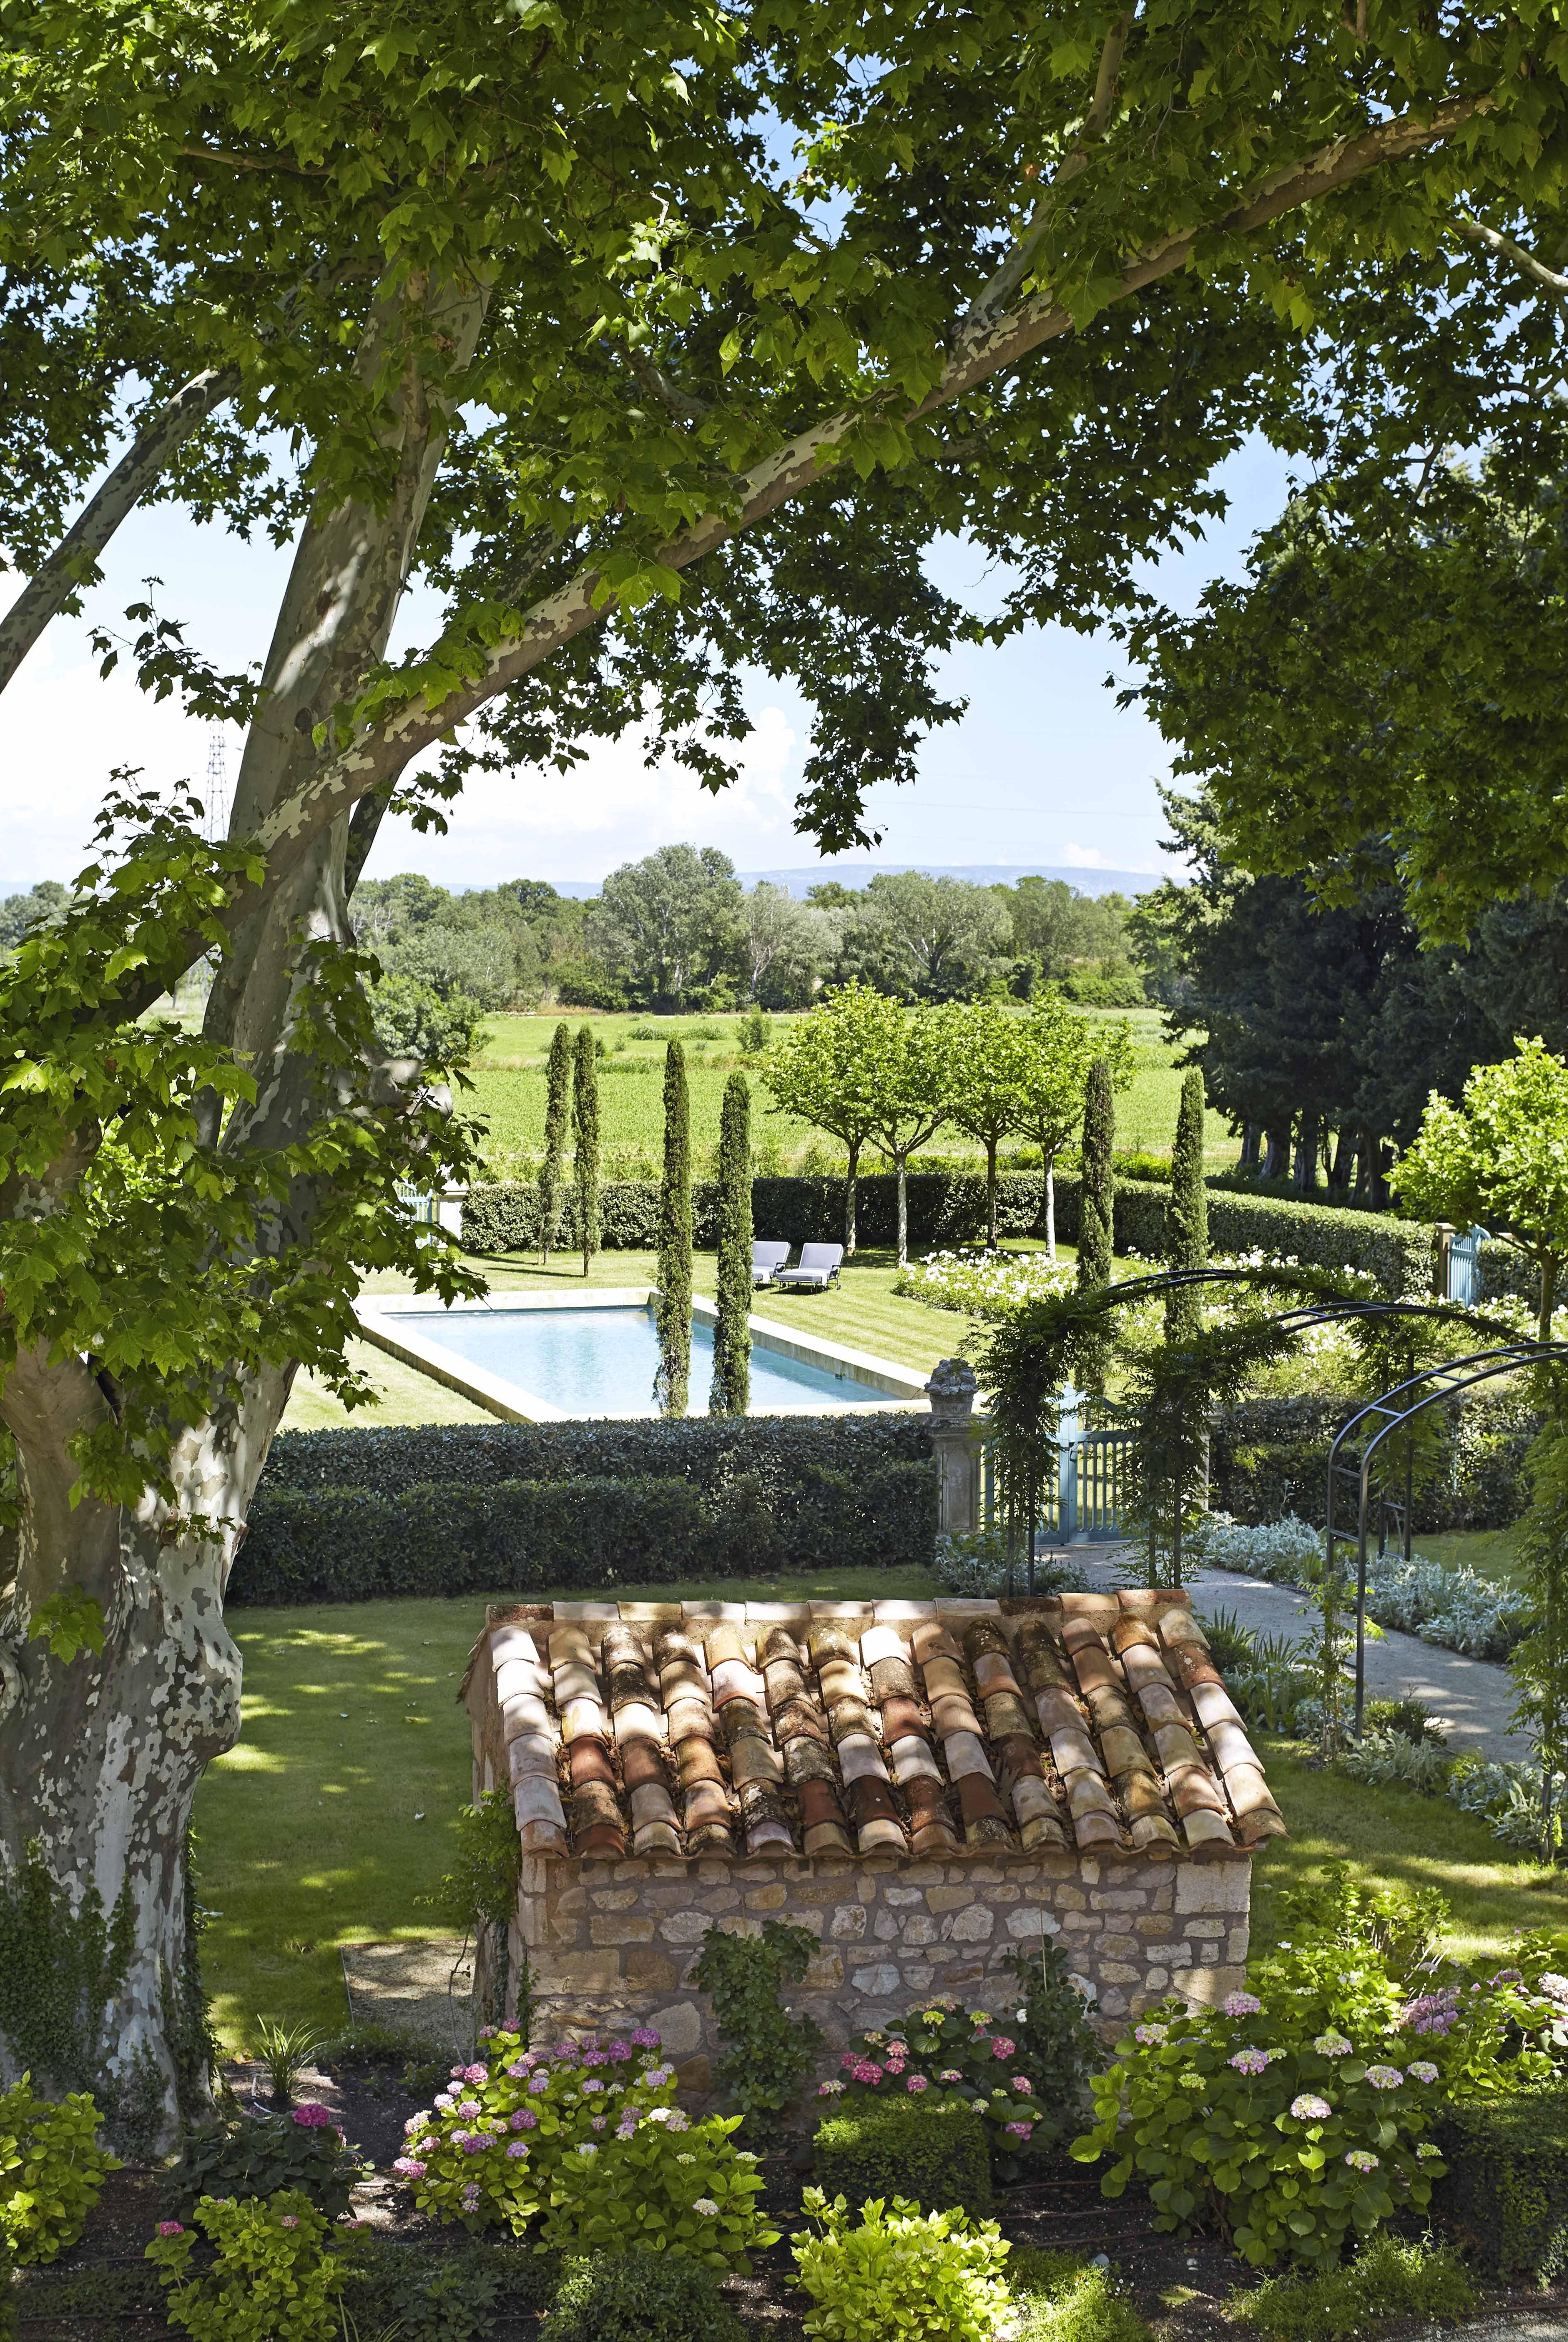 30 Best Swimming Pool Designs 2021 Gorgeous Backyard Pool Ideas